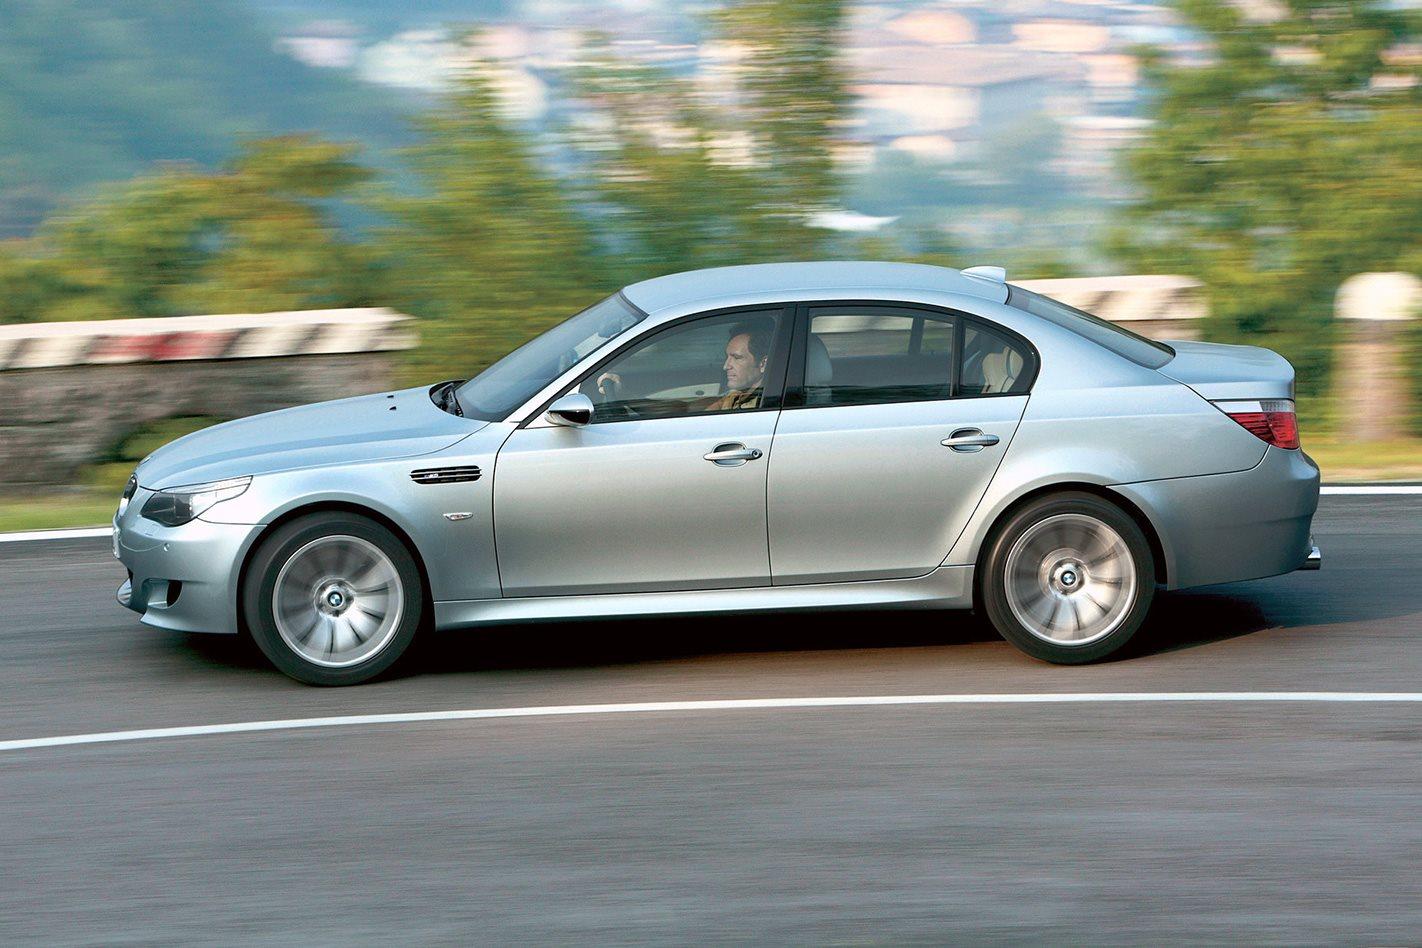 2005 E60 BMW M5 steering